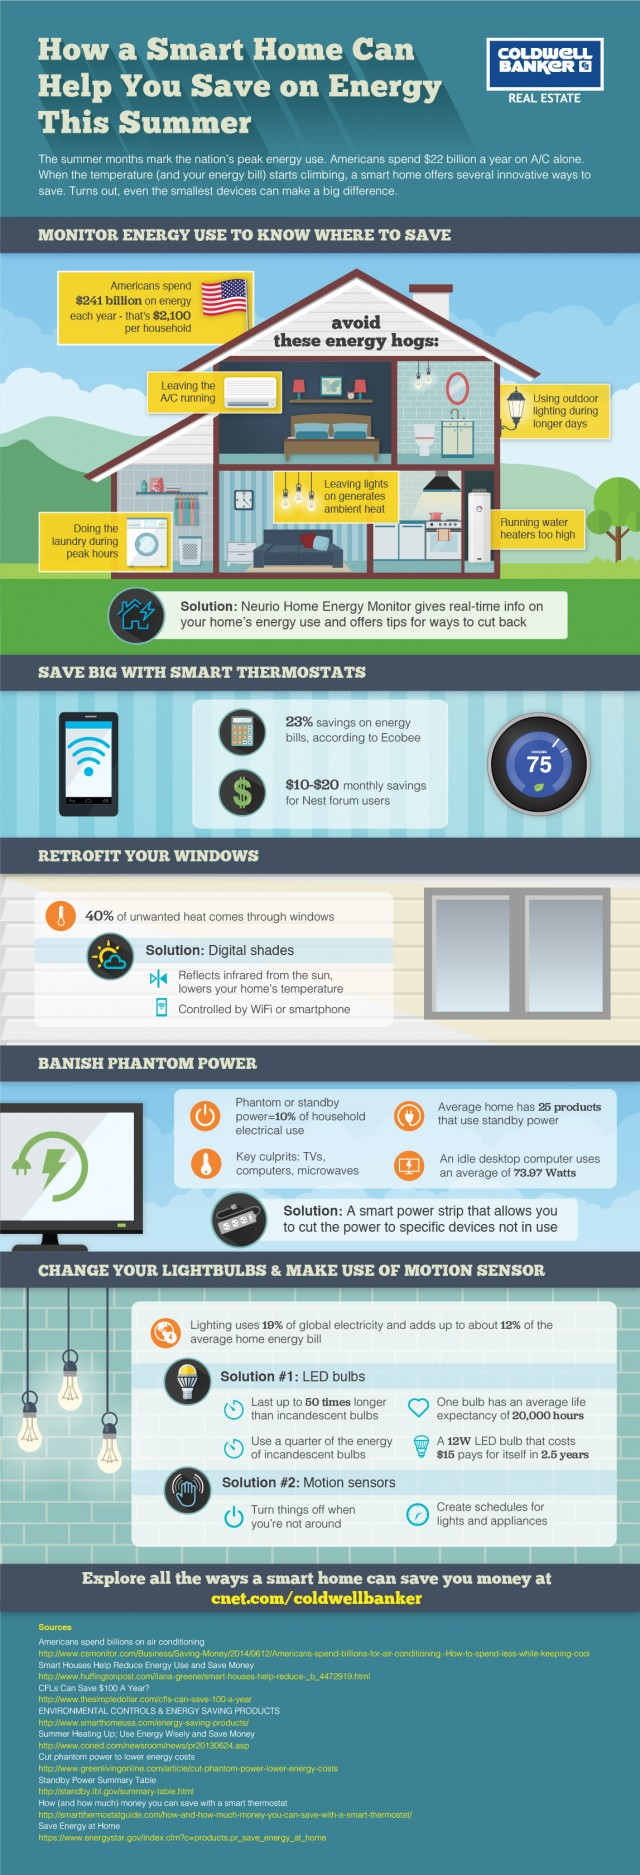 A Smart Home Saves You Money